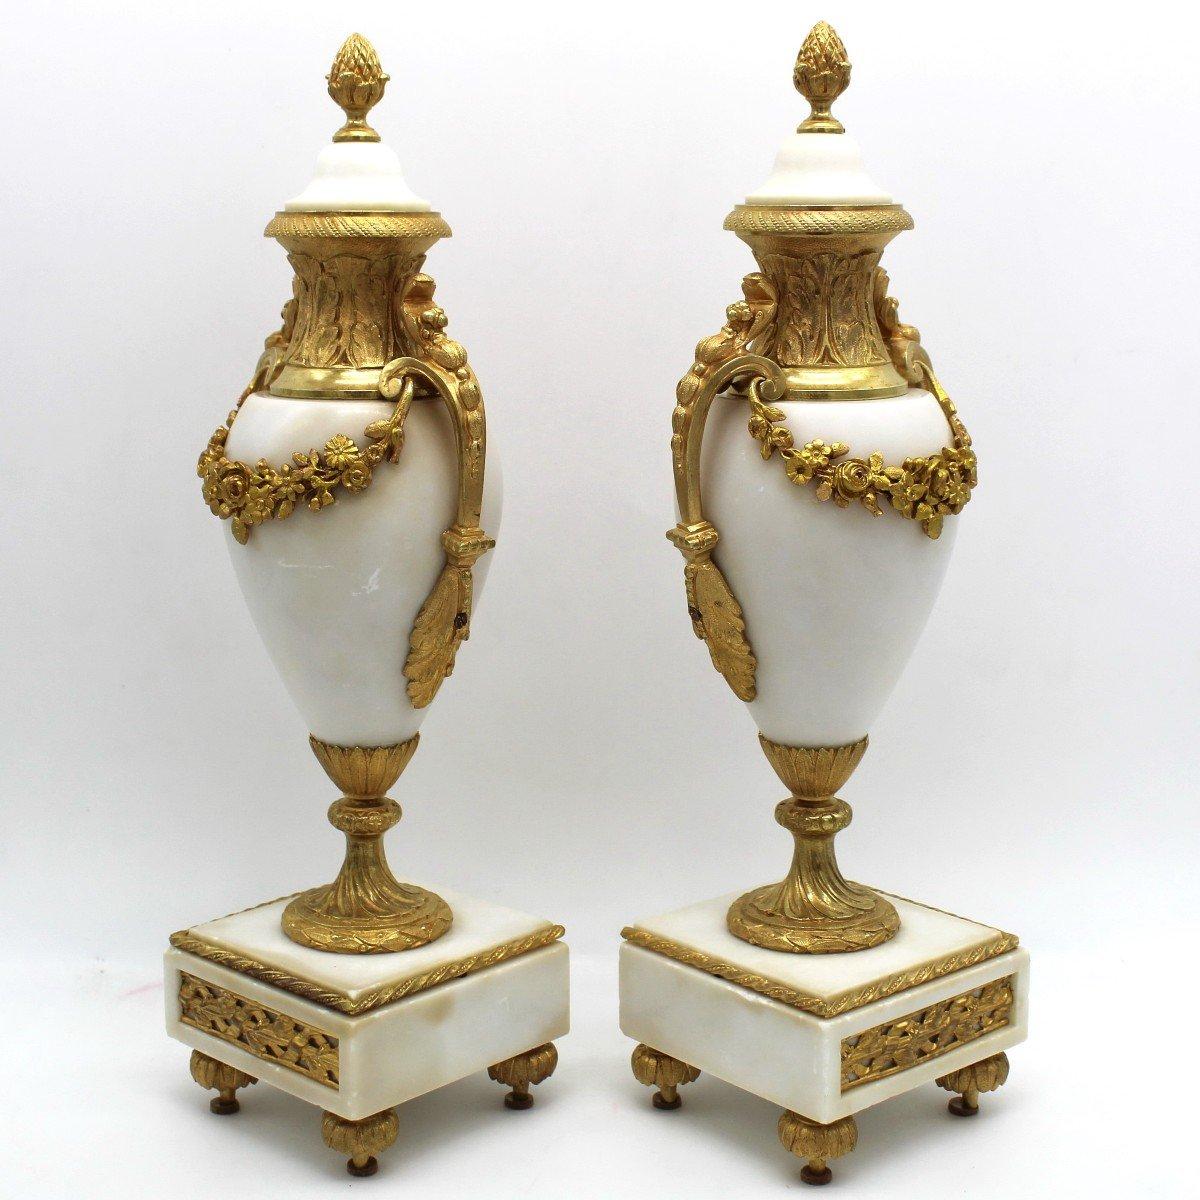 Antique Pair Of Napoleon III Cassolette Vases In Gilt Bronze - 19th-photo-4